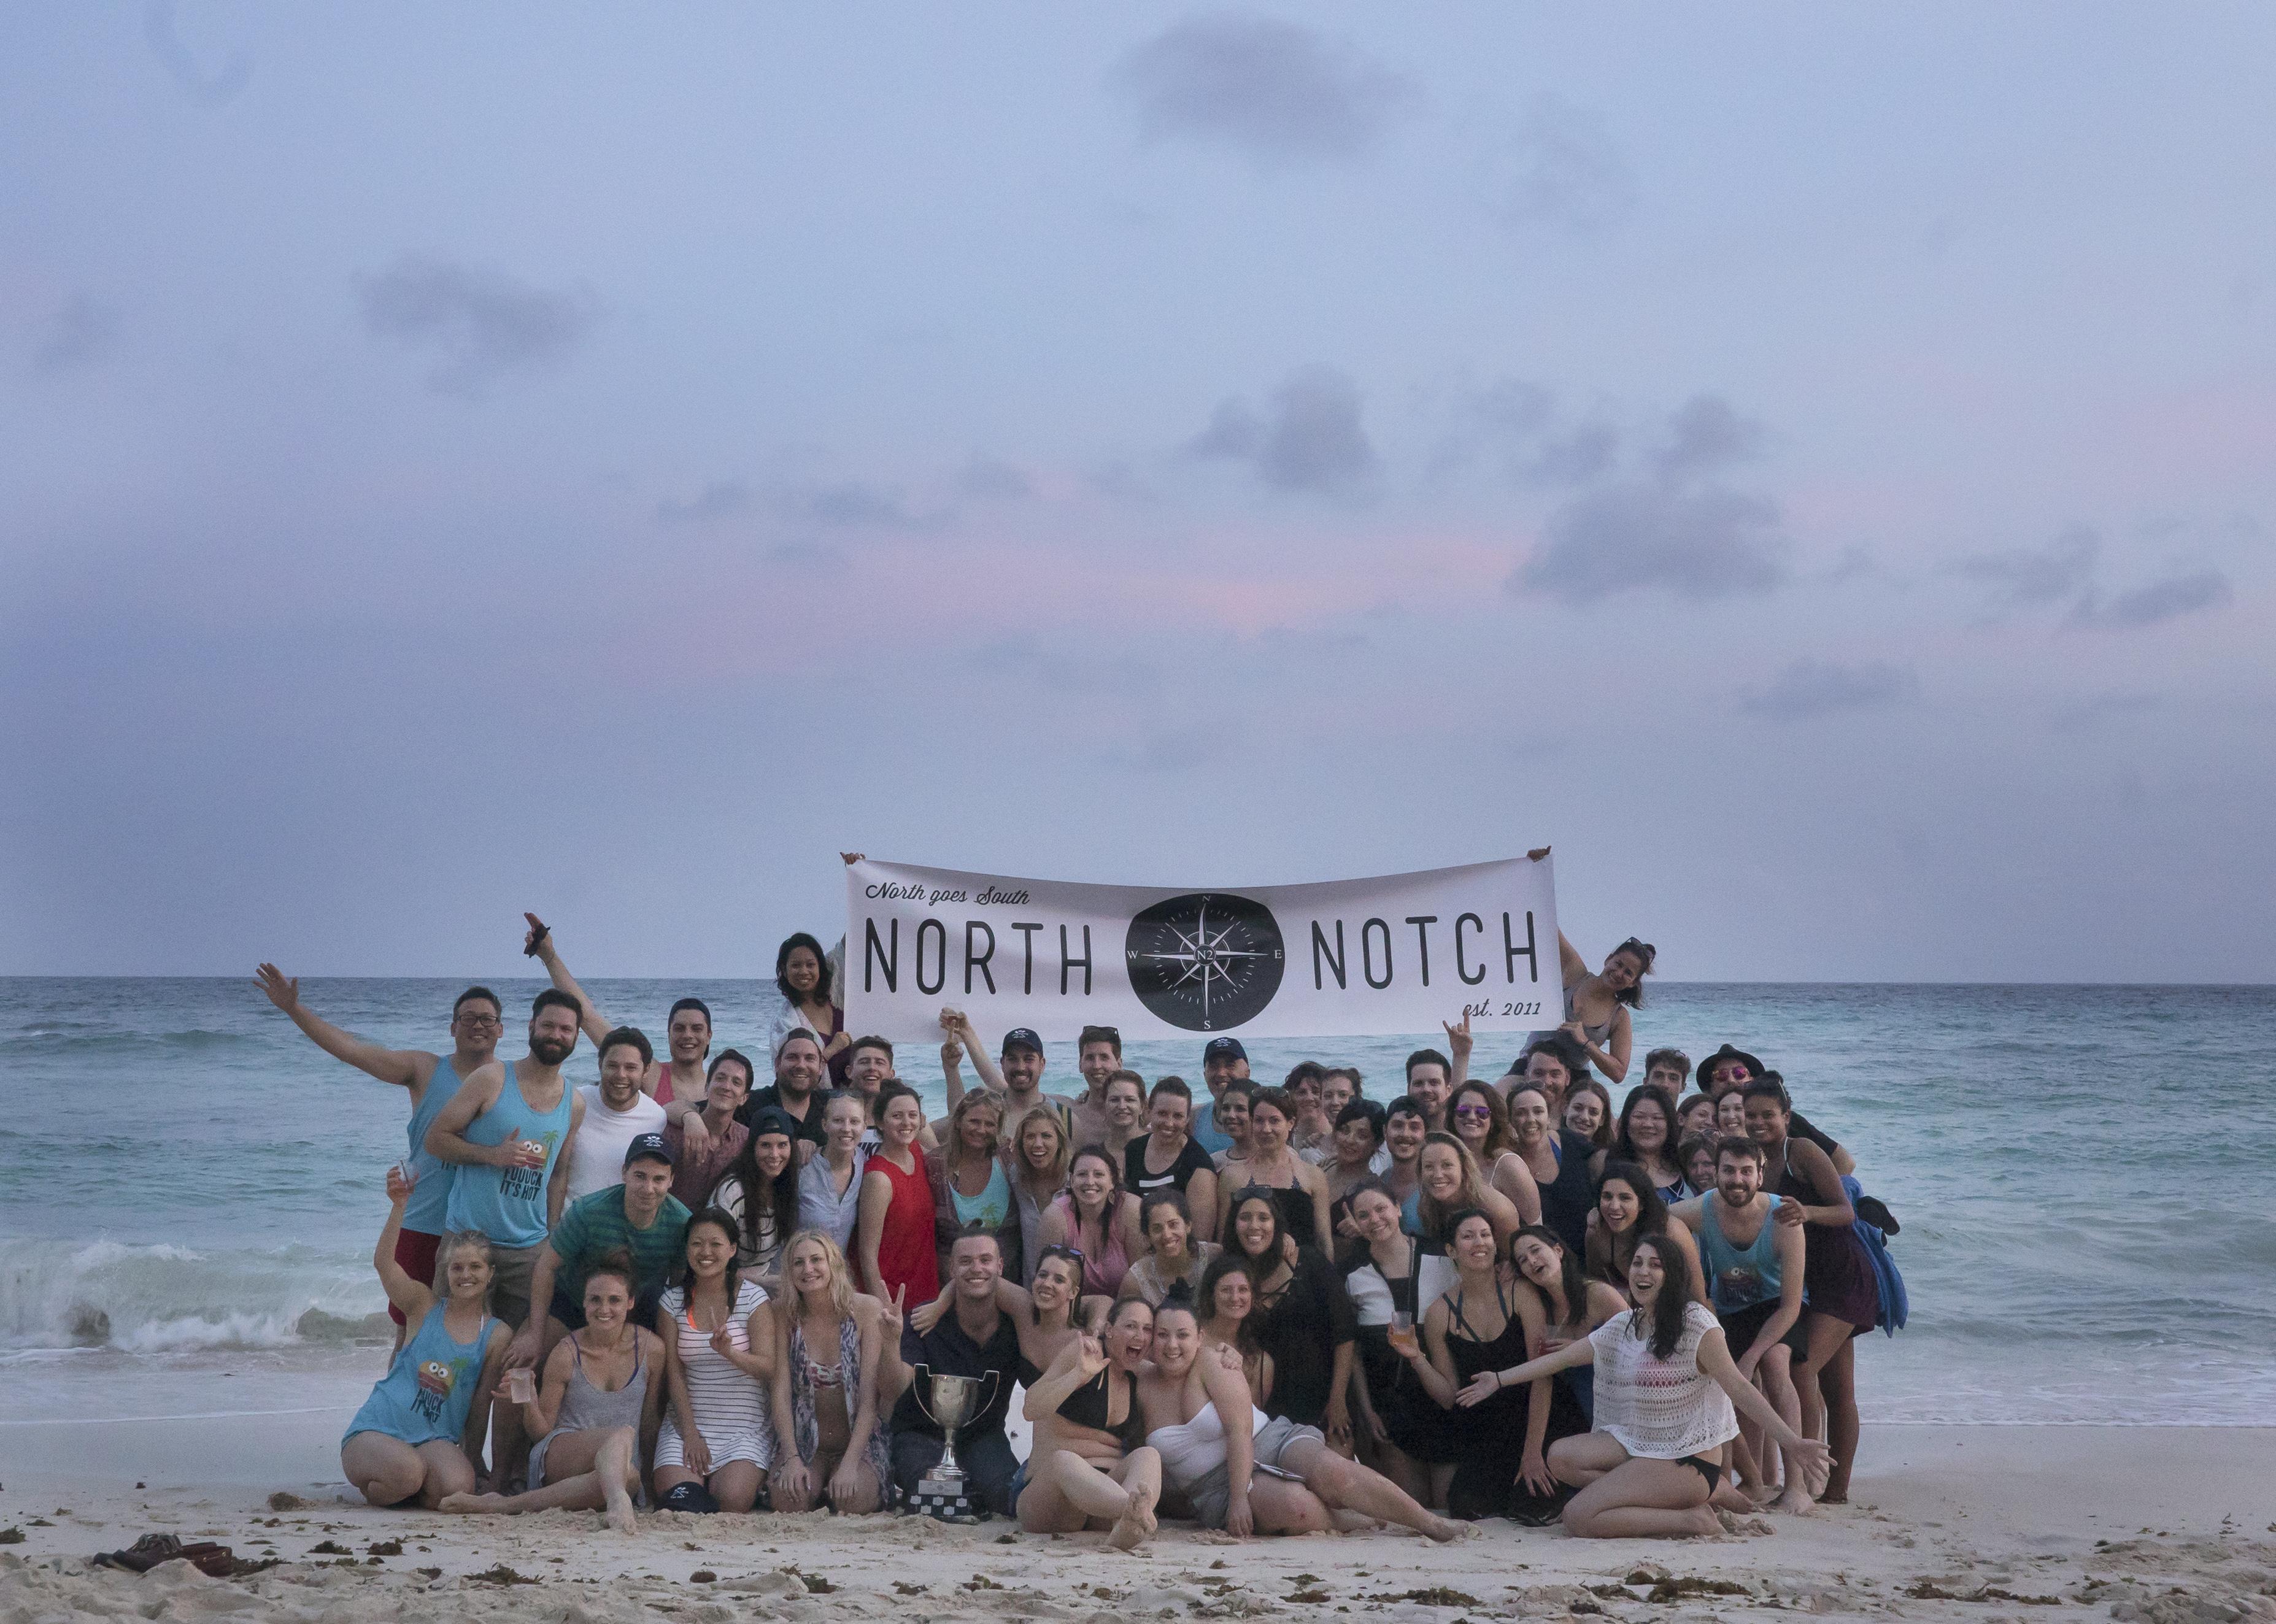 North Strategic group photo